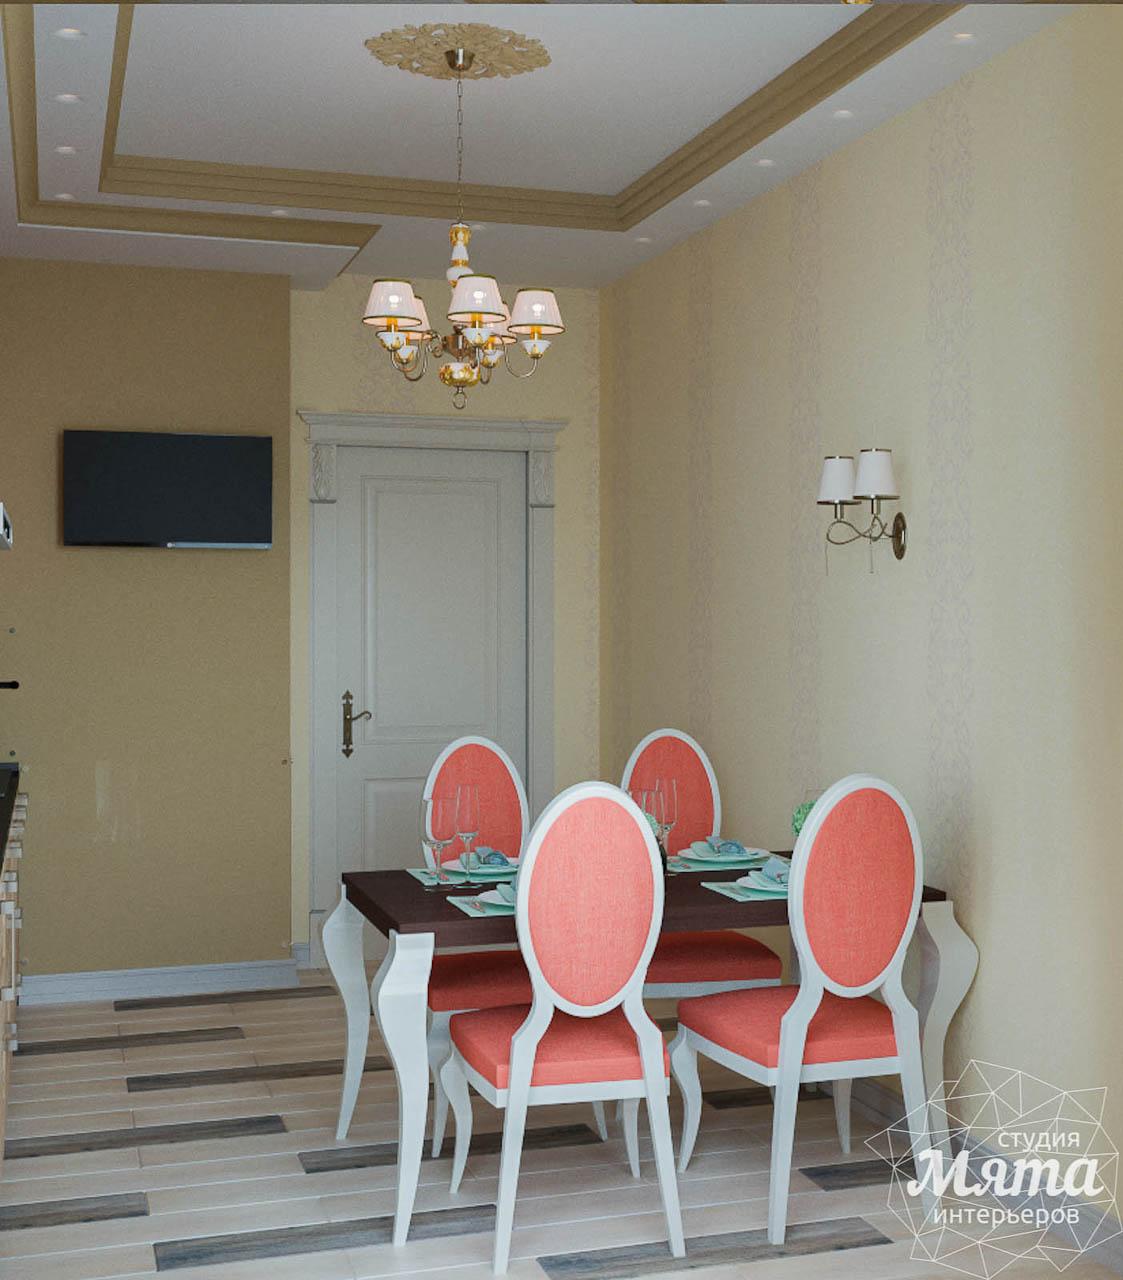 Дизайн интерьера и ремонт трехкомнатной квартиры в Карасьозерском 2 img2122187679